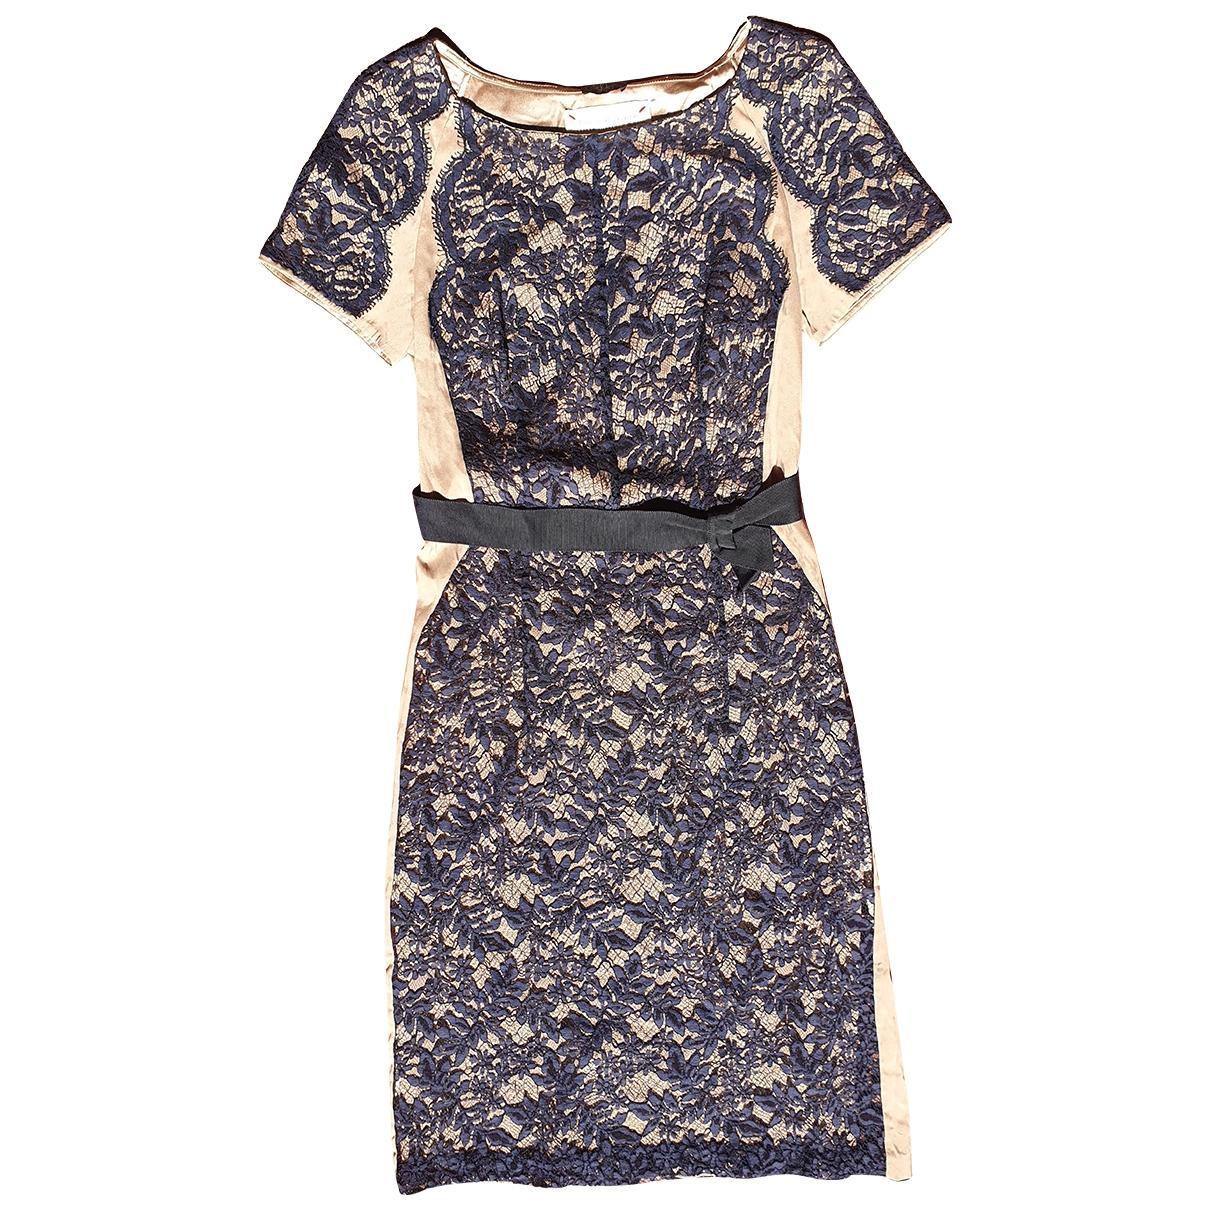 Collette Dinnigan \N Blue Silk dress for Women S International